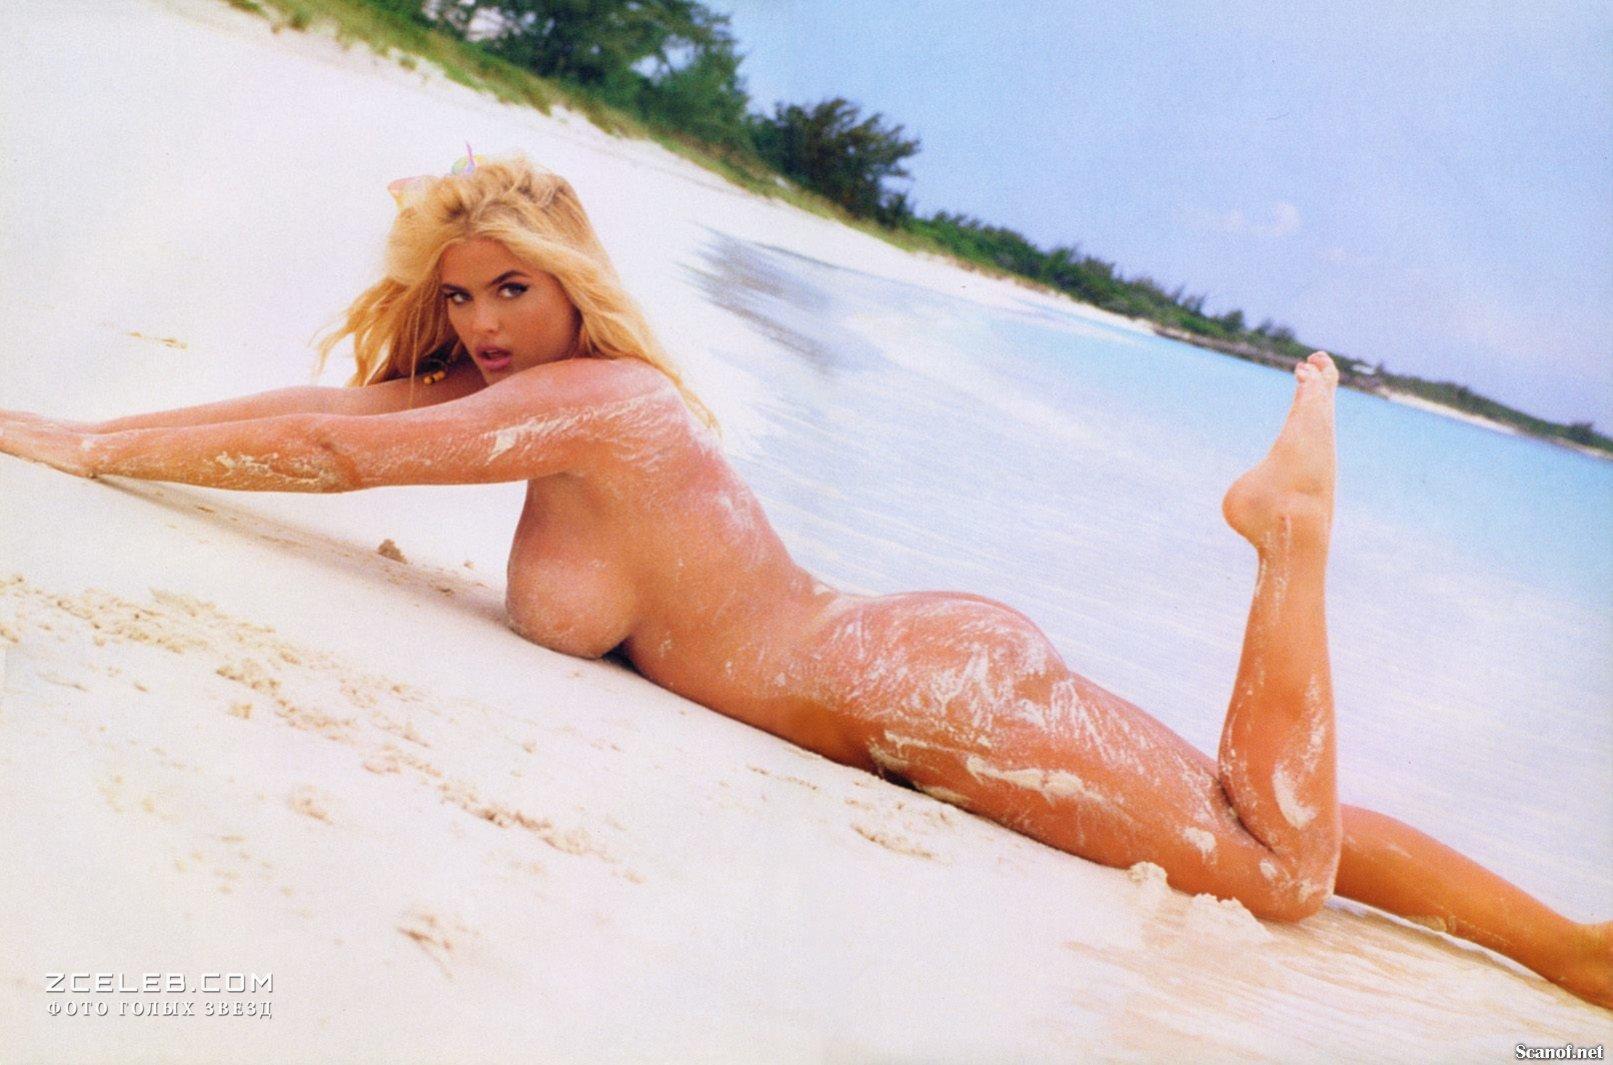 Anna nicole smith signed playboy photo nude rare full signature